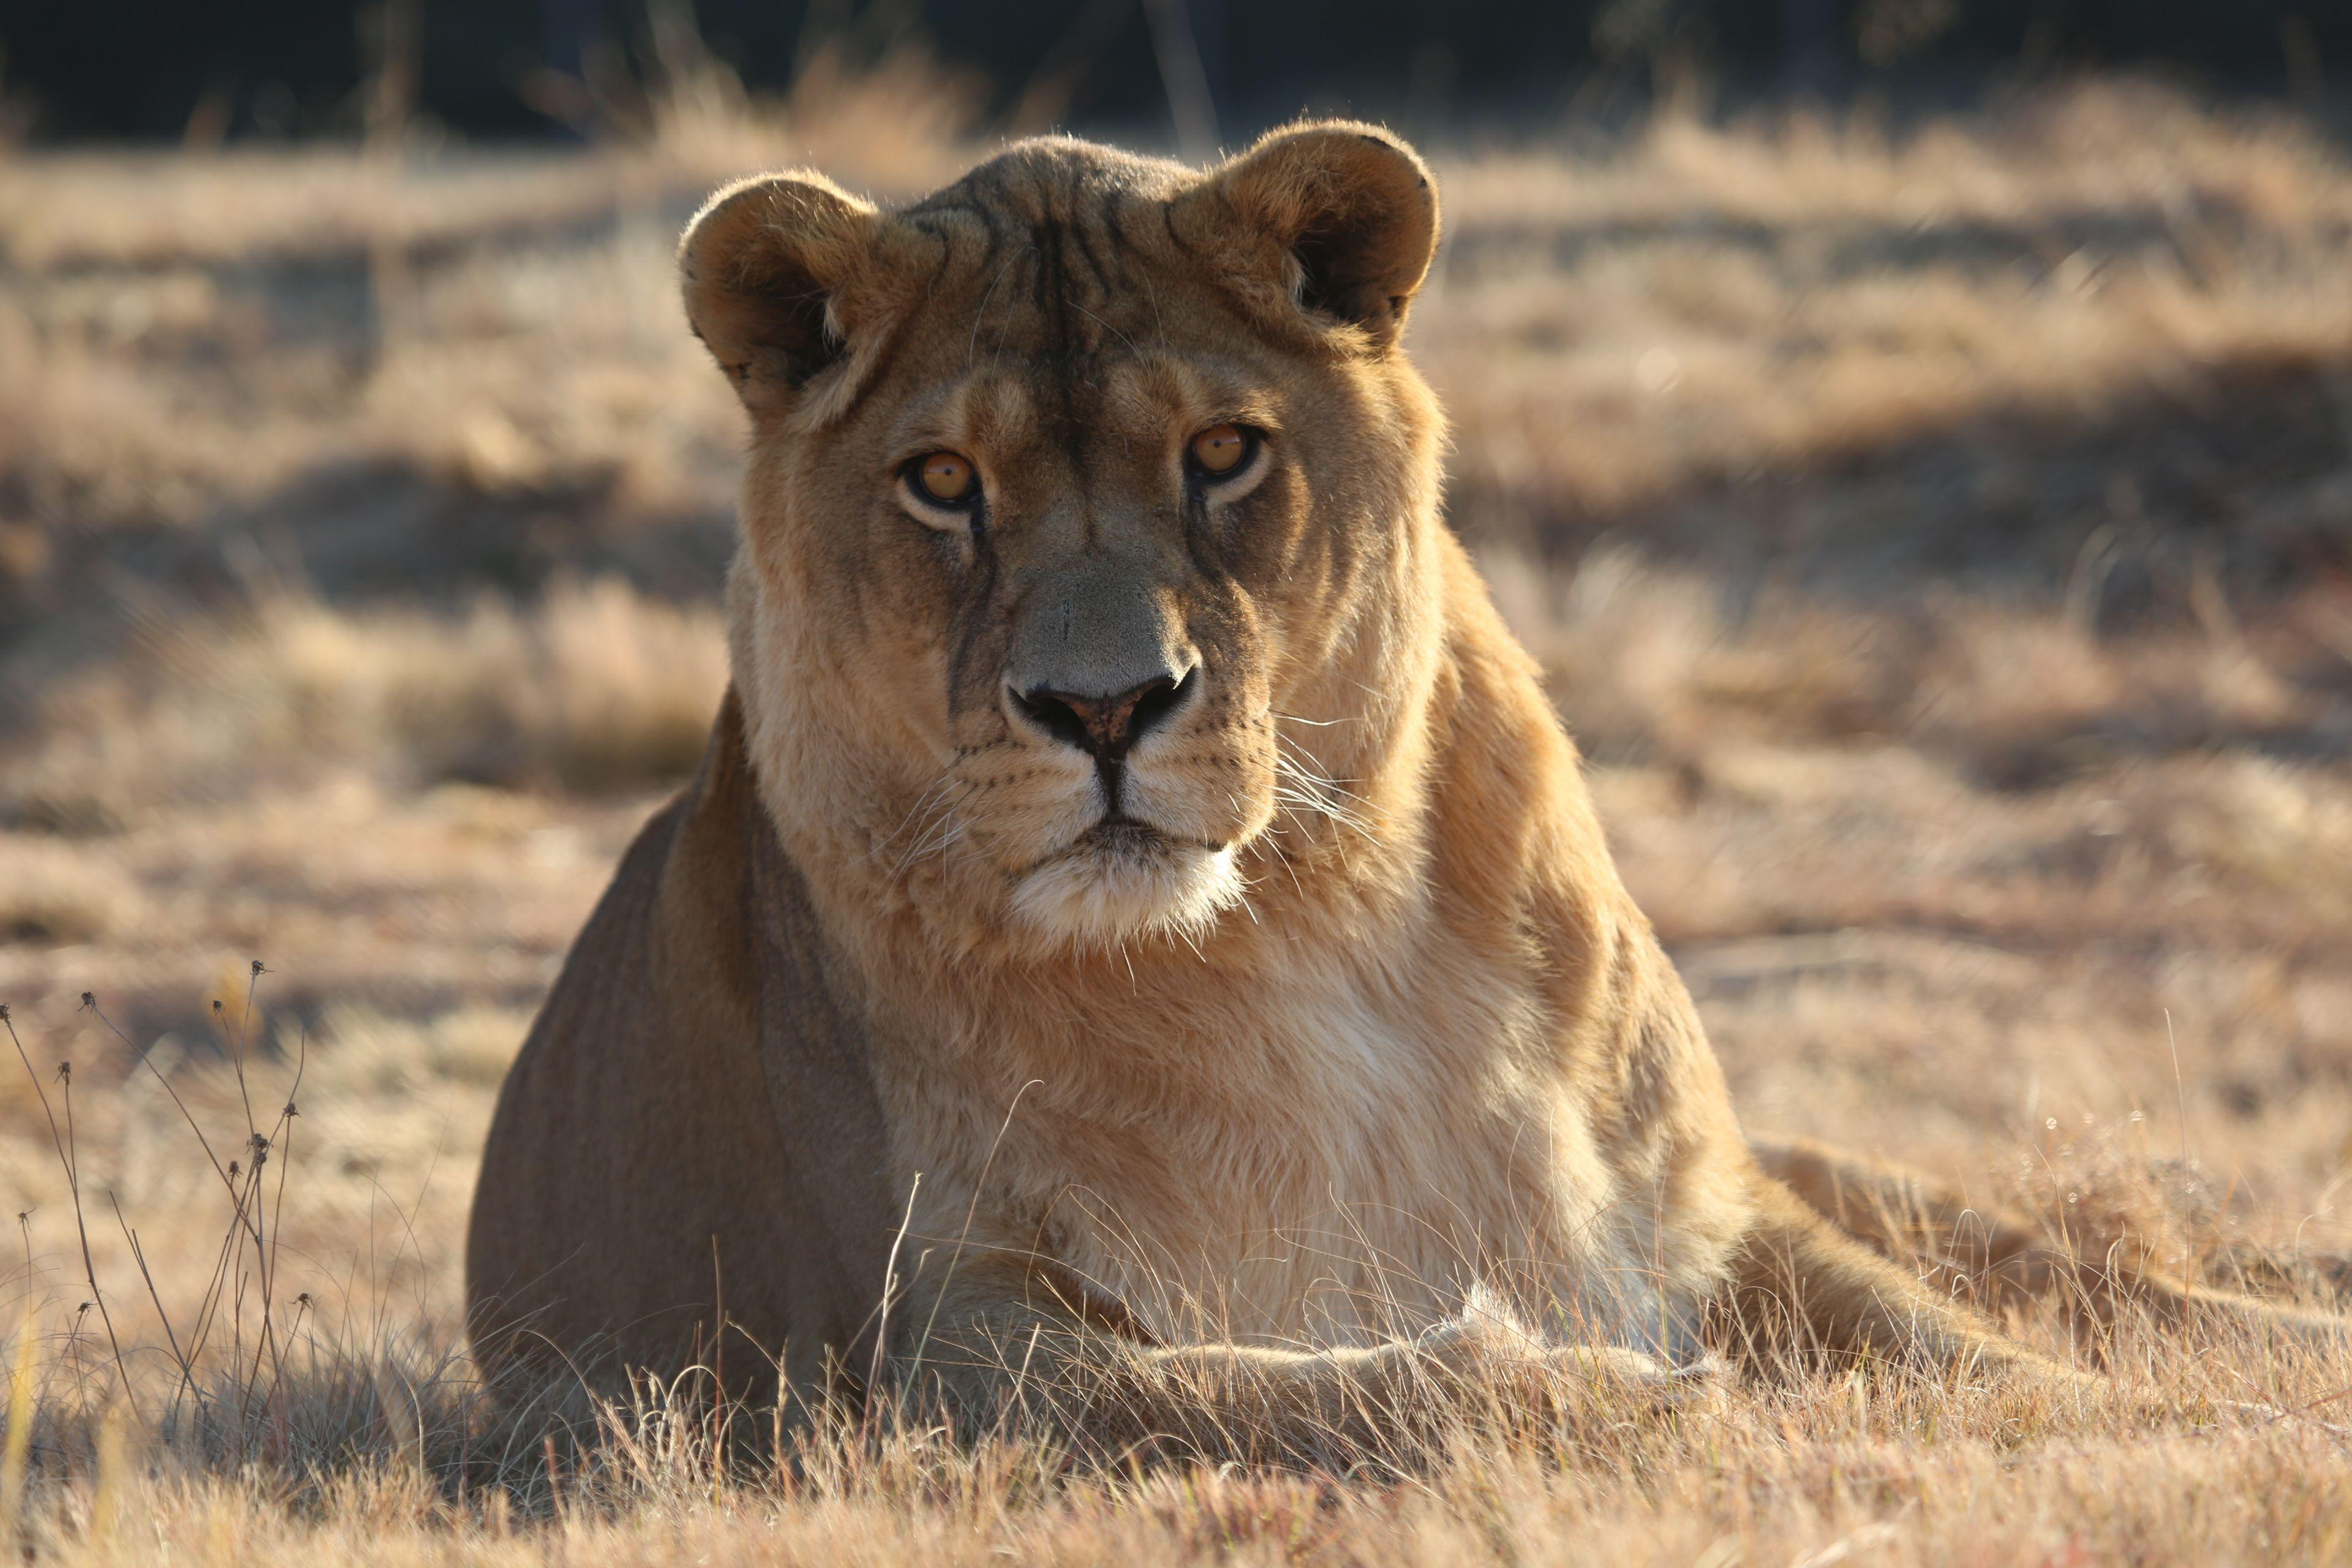 Lion Pregan in LIONSROCK